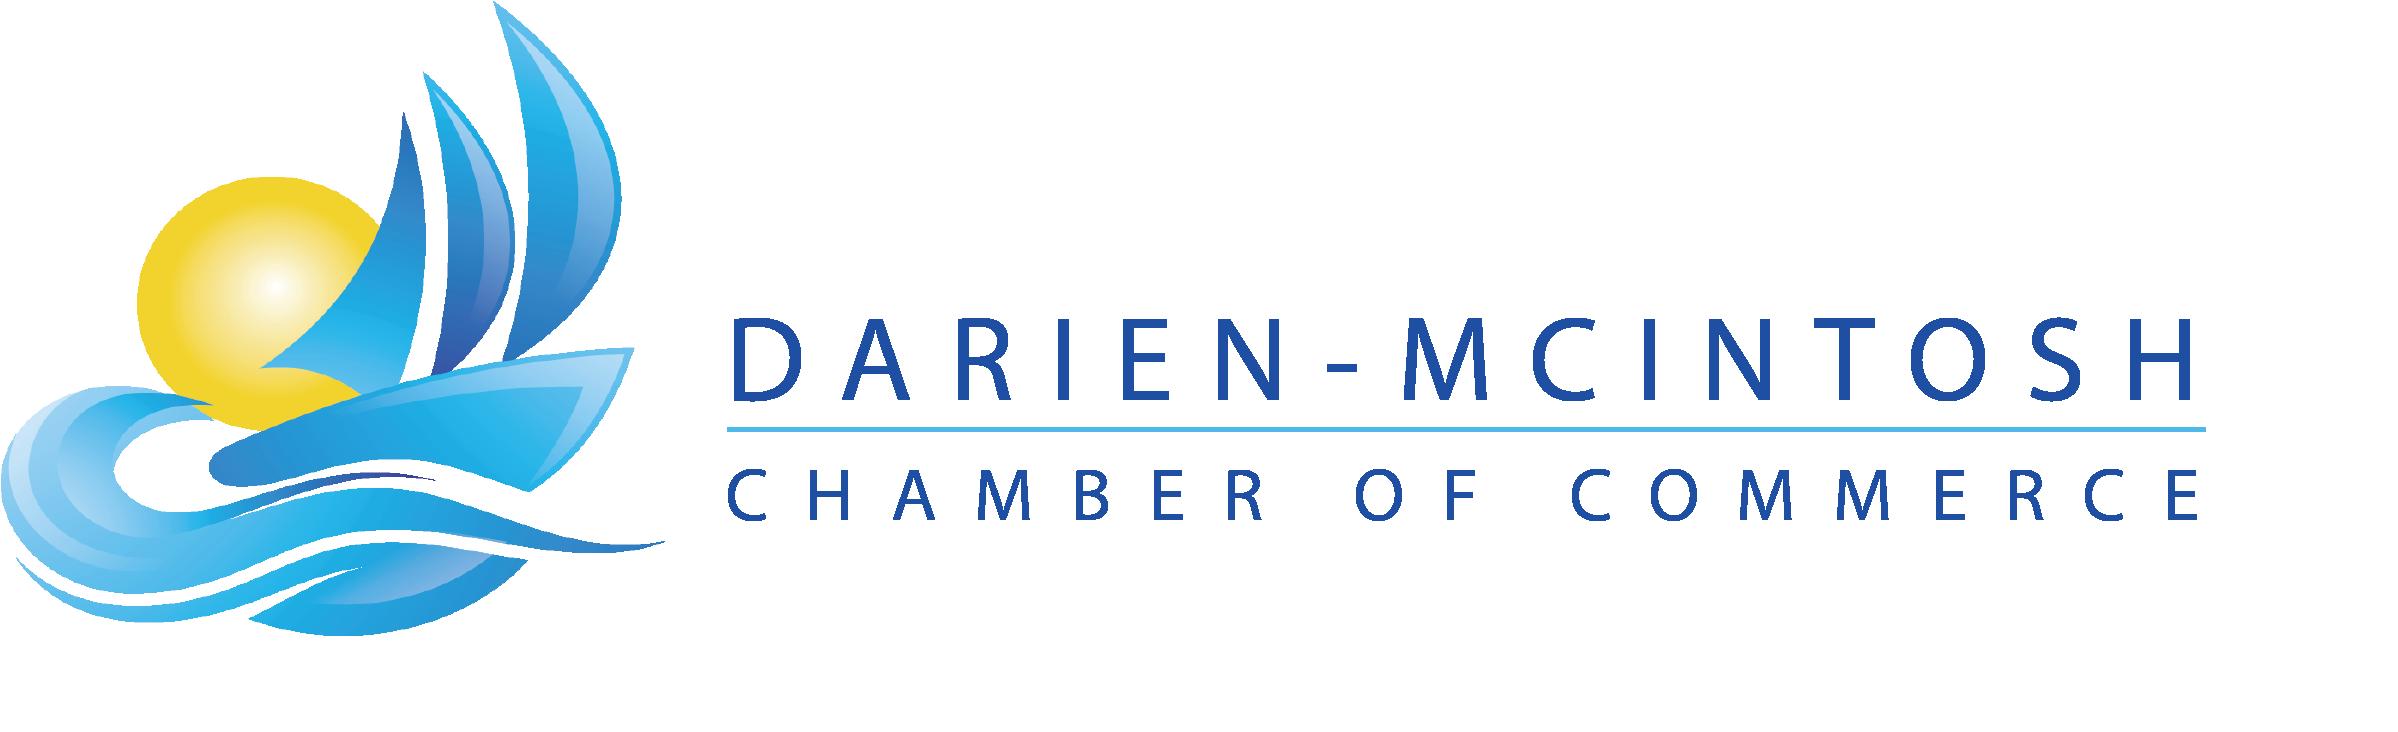 Darien - McIntosh Chamber